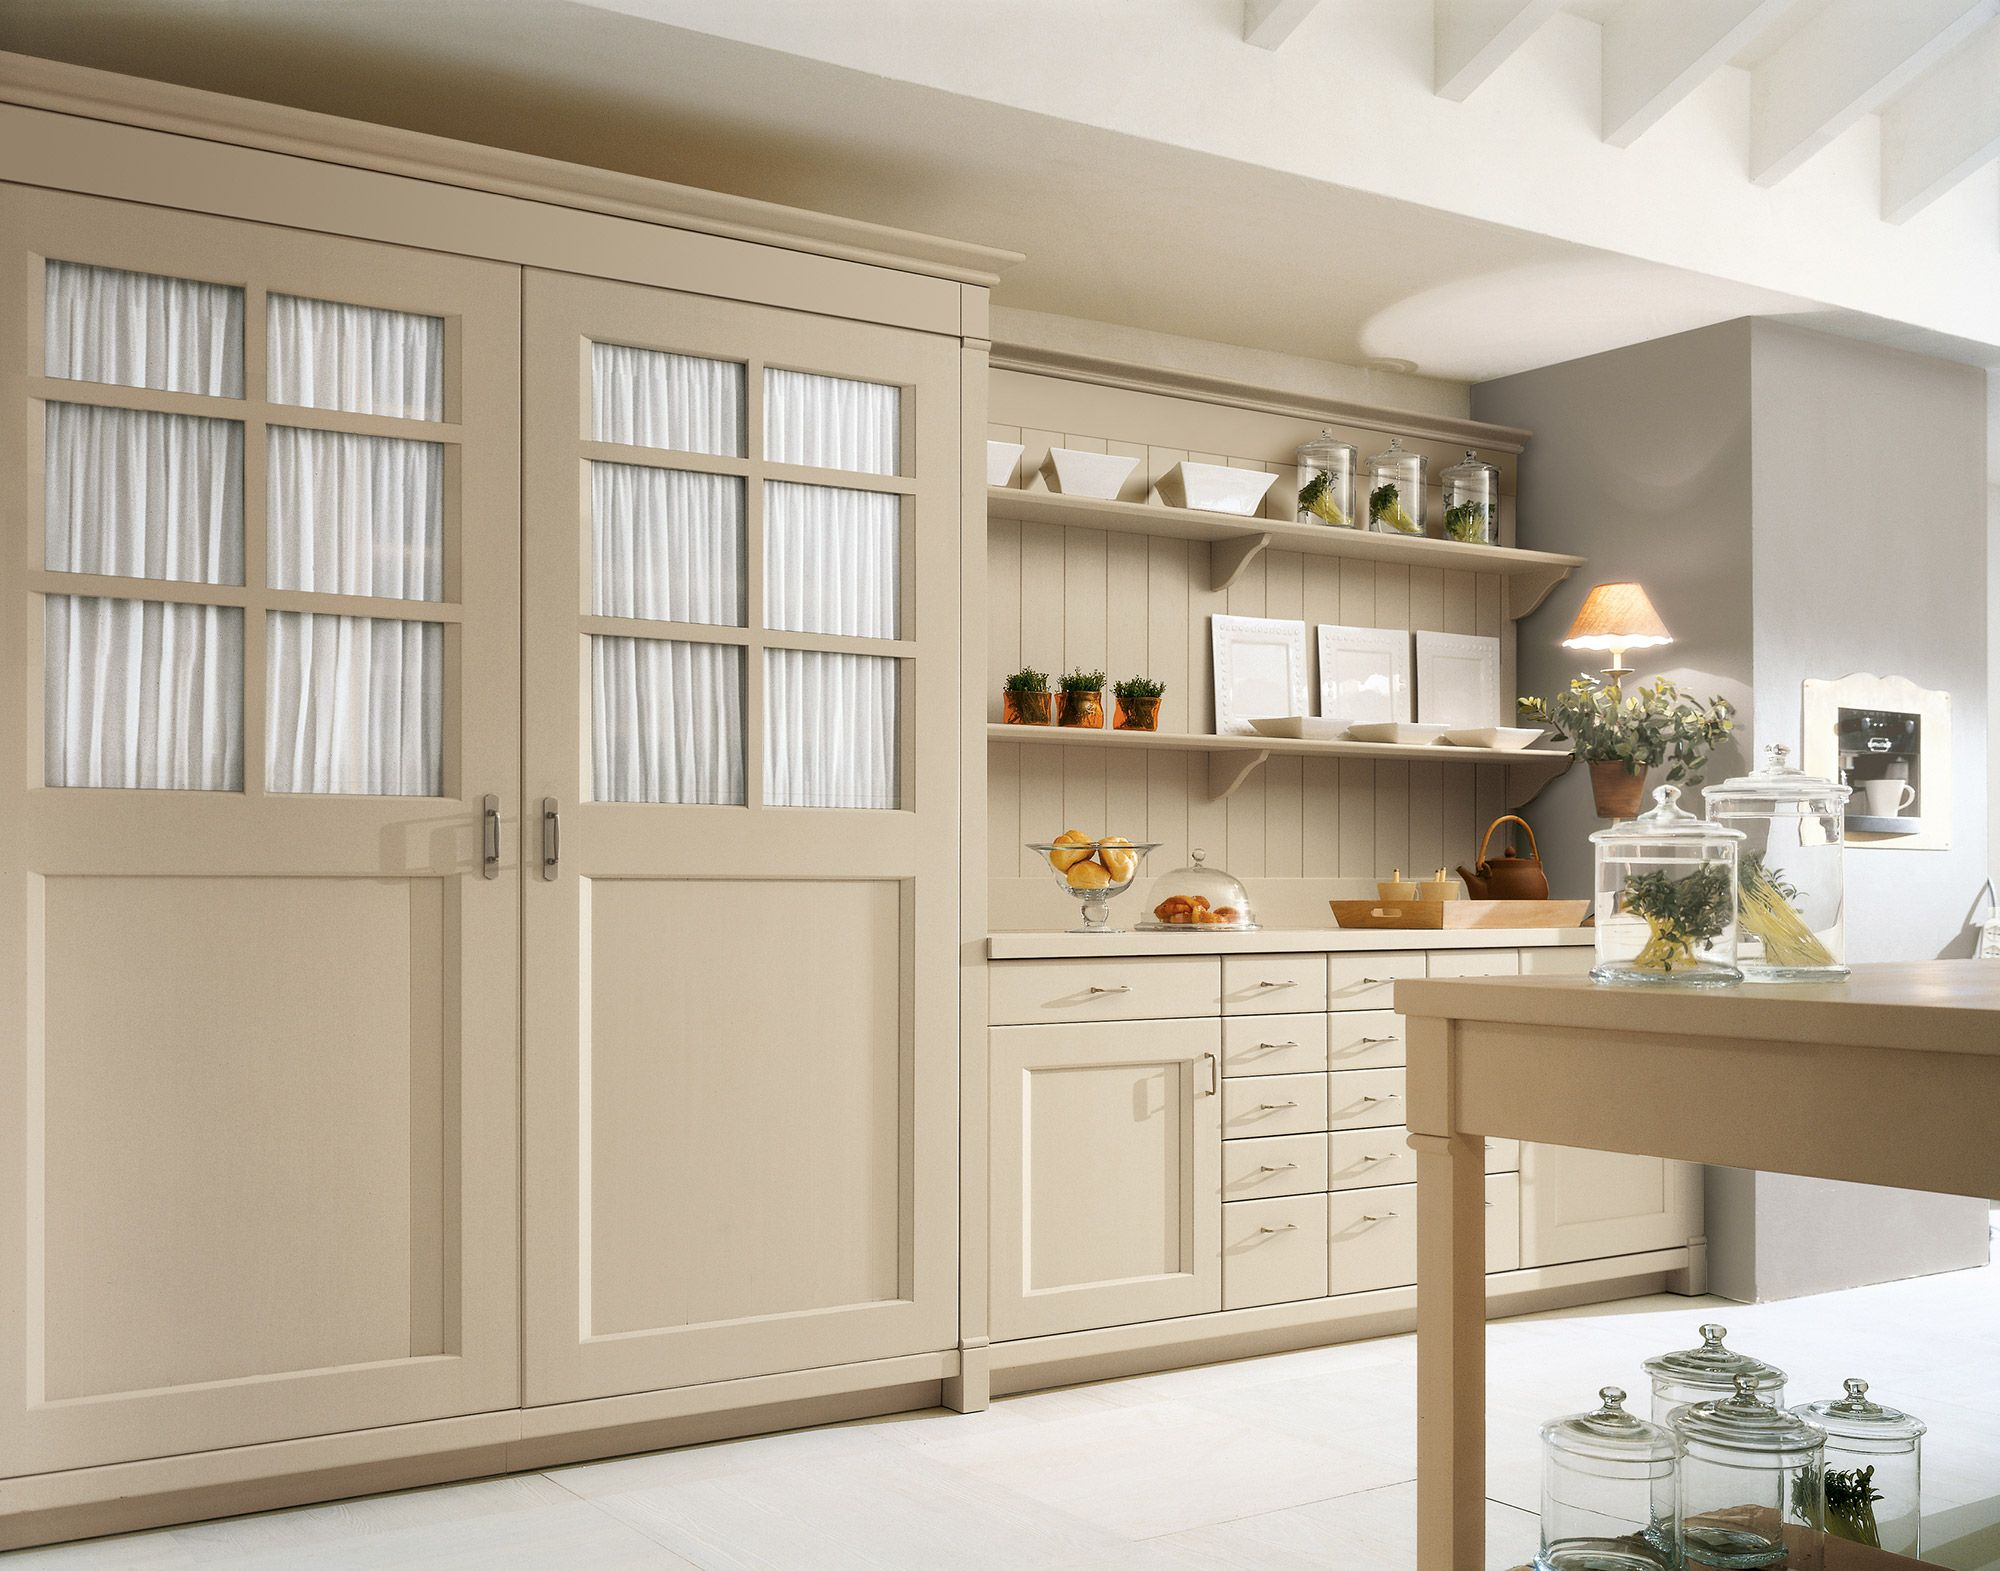 Emejing Cucine English Mood Images - Home Ideas - tyger.us